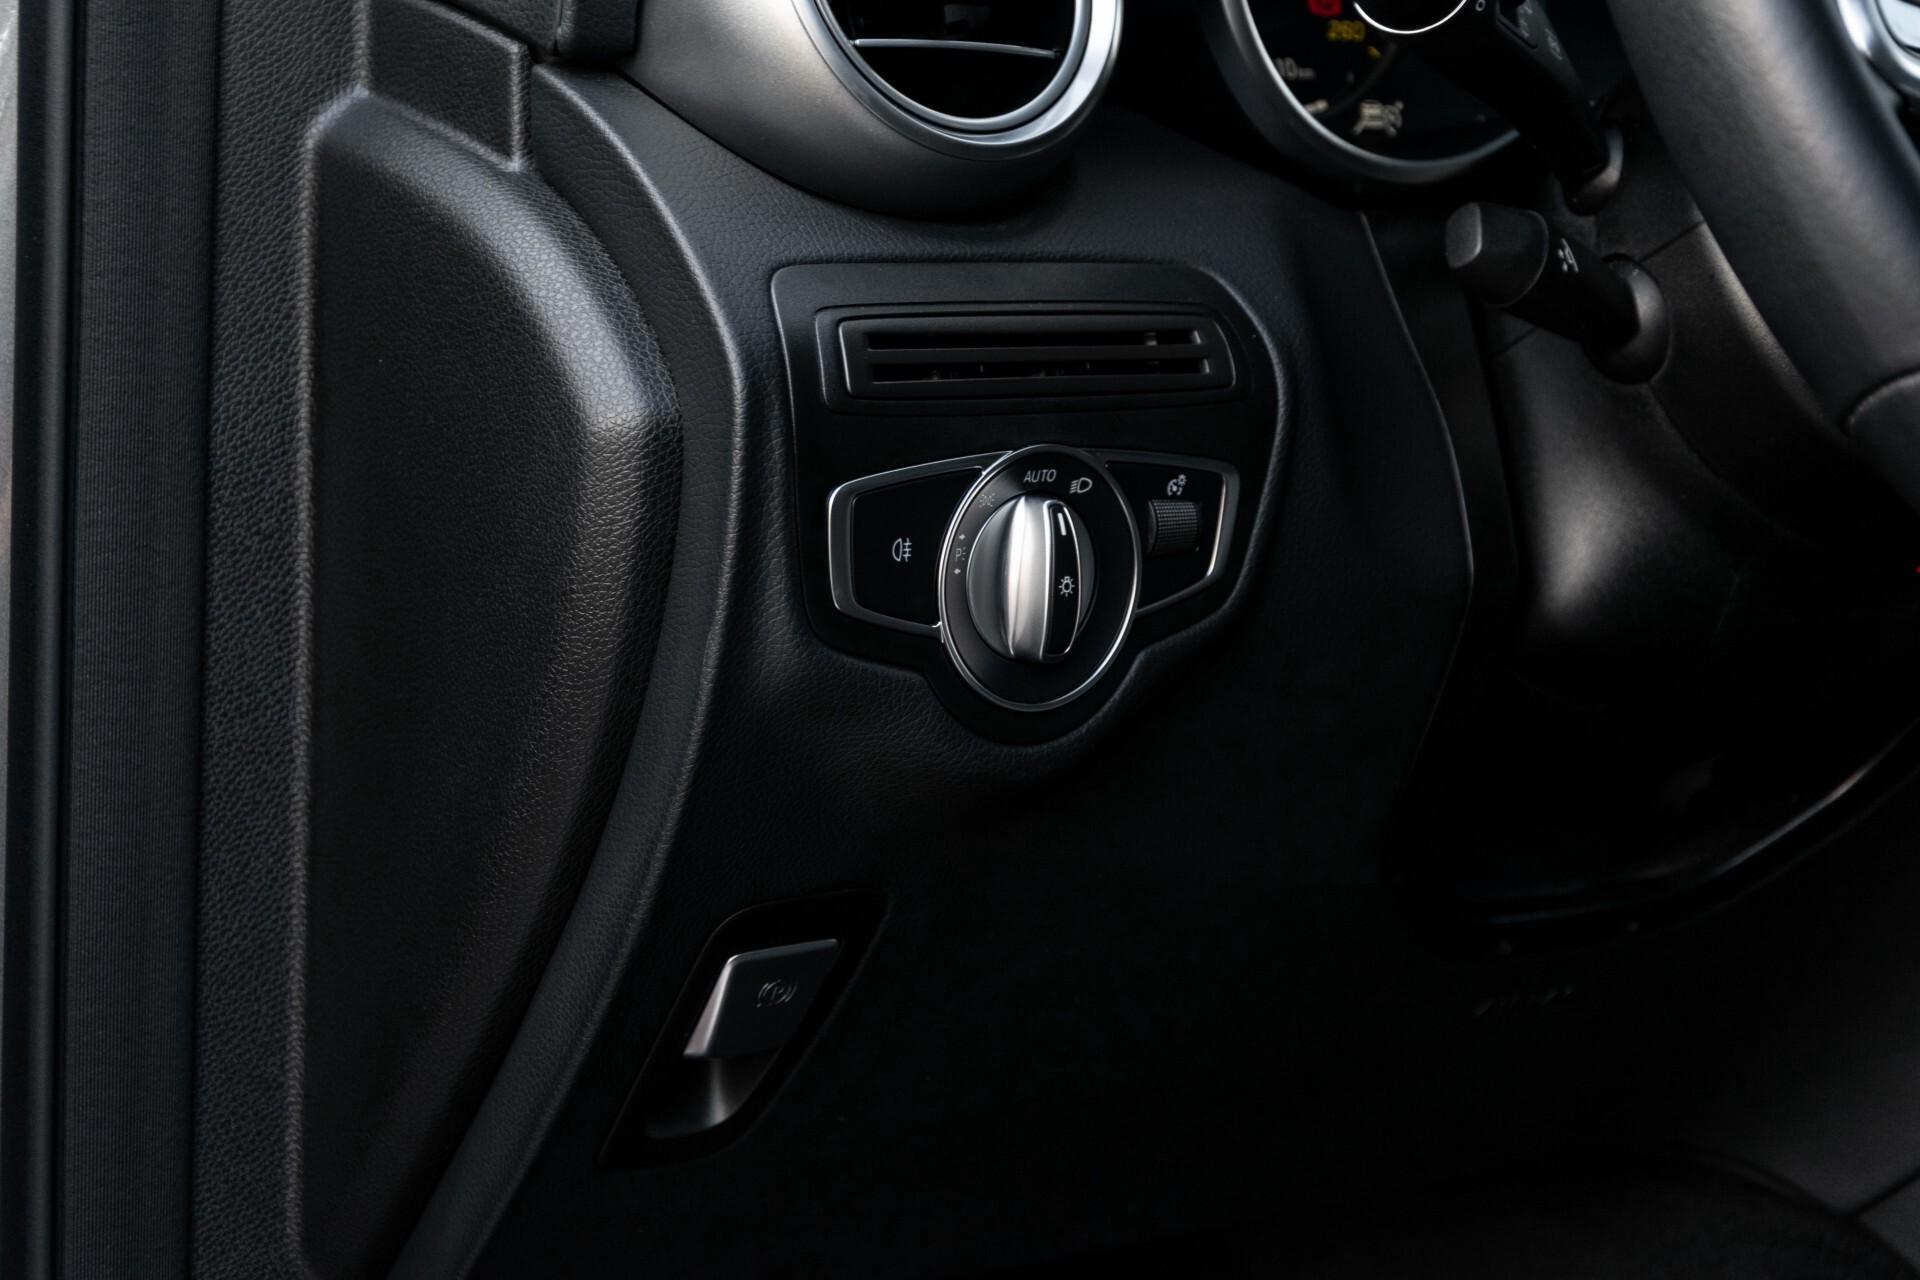 Mercedes-Benz GLC 300e 4-M Luchtvering/Panorama/Multicontourstoelen/Rij-assistentie/Standkachel Aut9 Foto 33